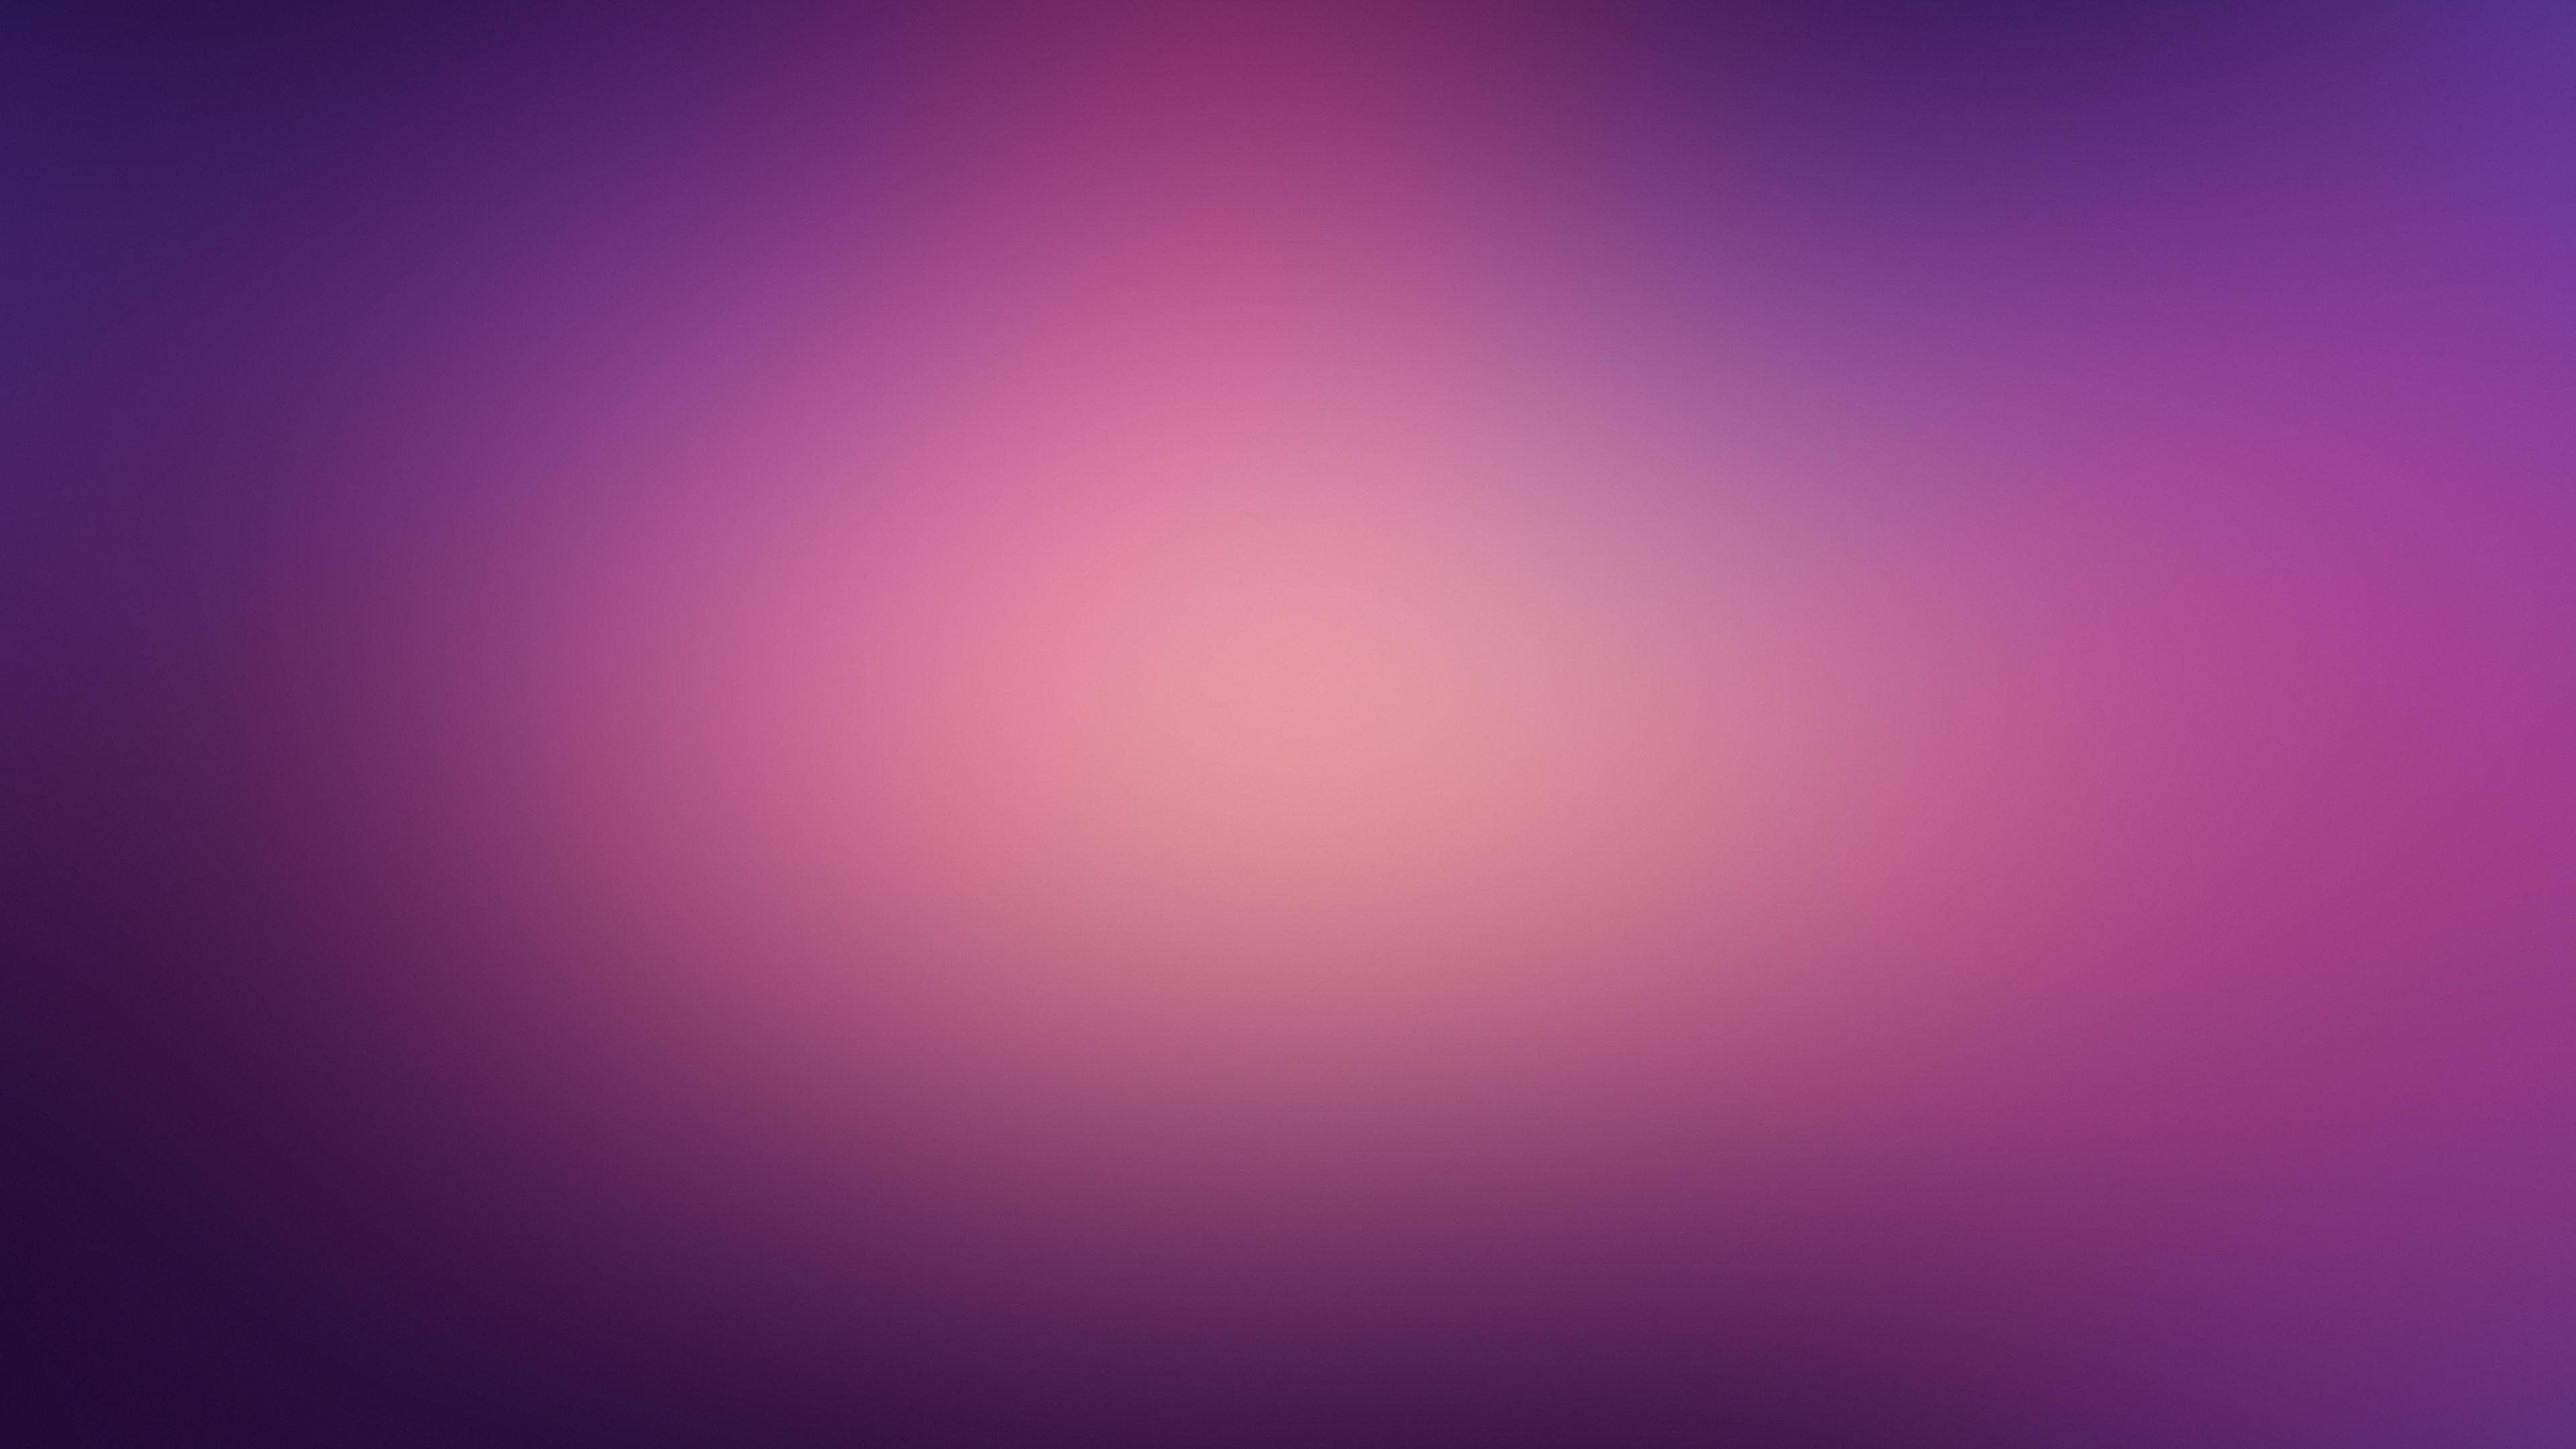 abstract pink blur 4k 1546277912 - Abstract Pink Blur 4k - pink wallpapers, hd-wallpapers, deviantart wallpapers, blur wallpapers, abstract wallpapers, 4k-wallpapers